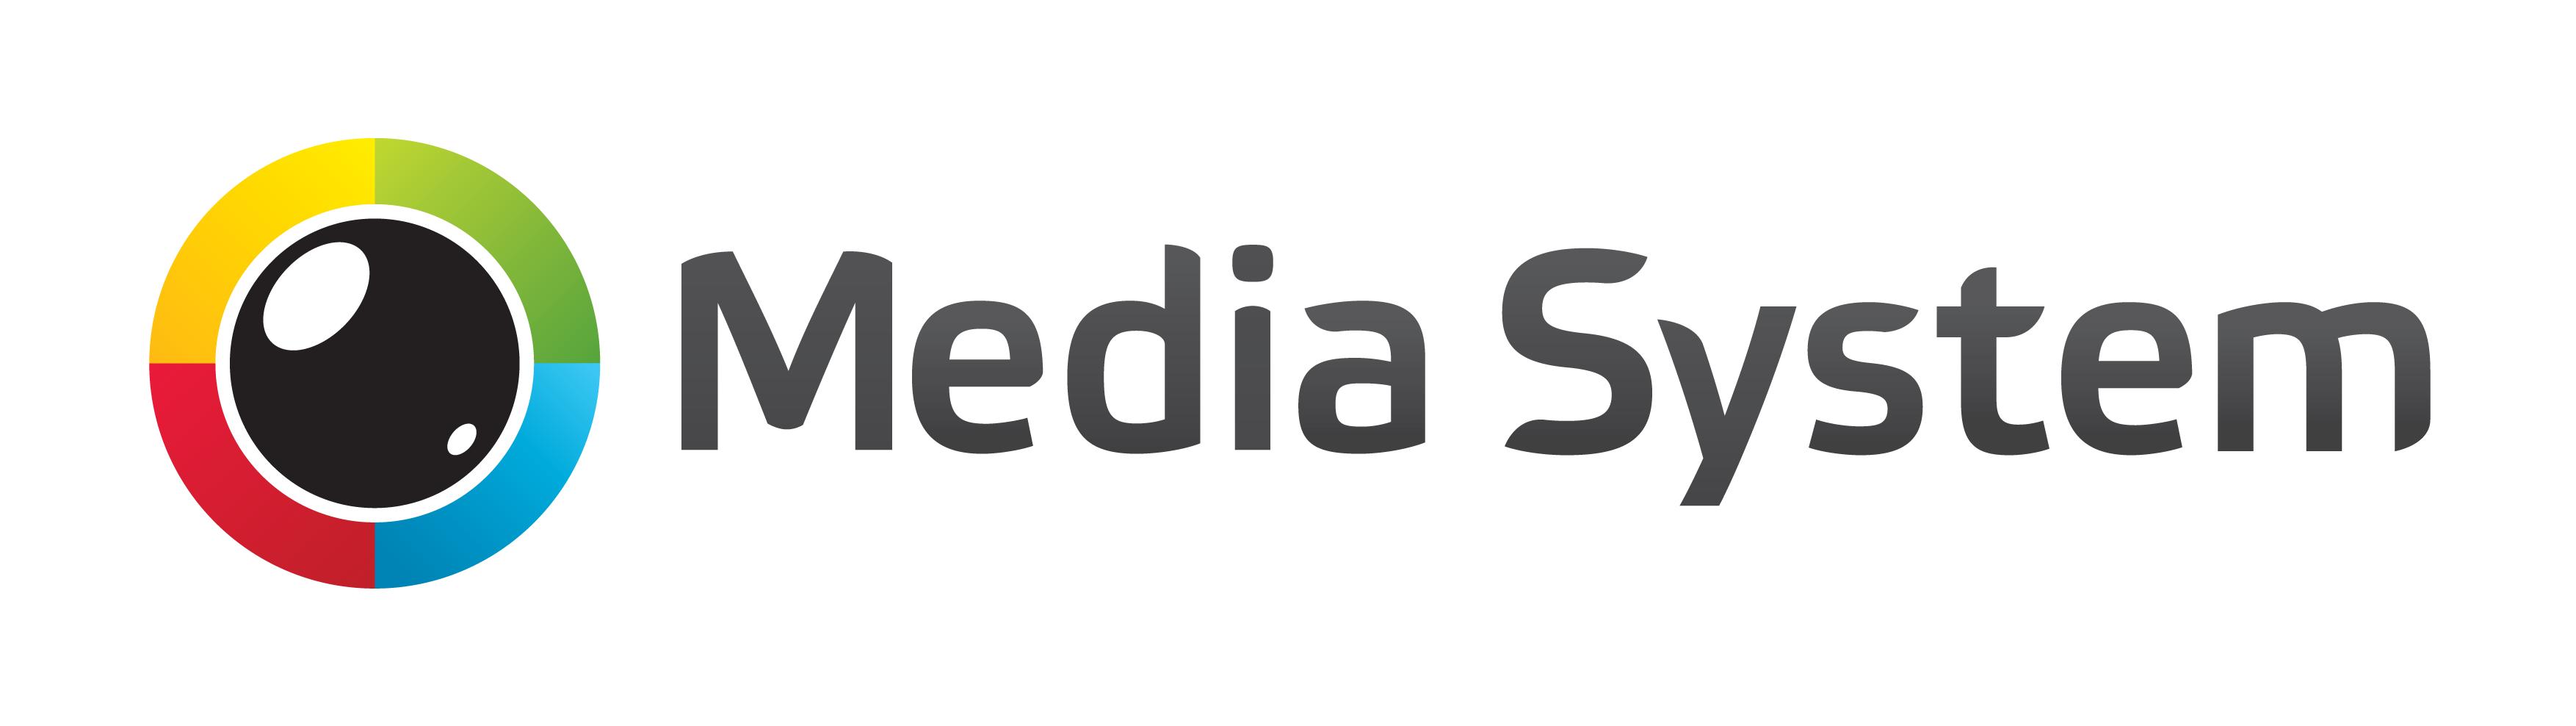 MS_logo_PSD